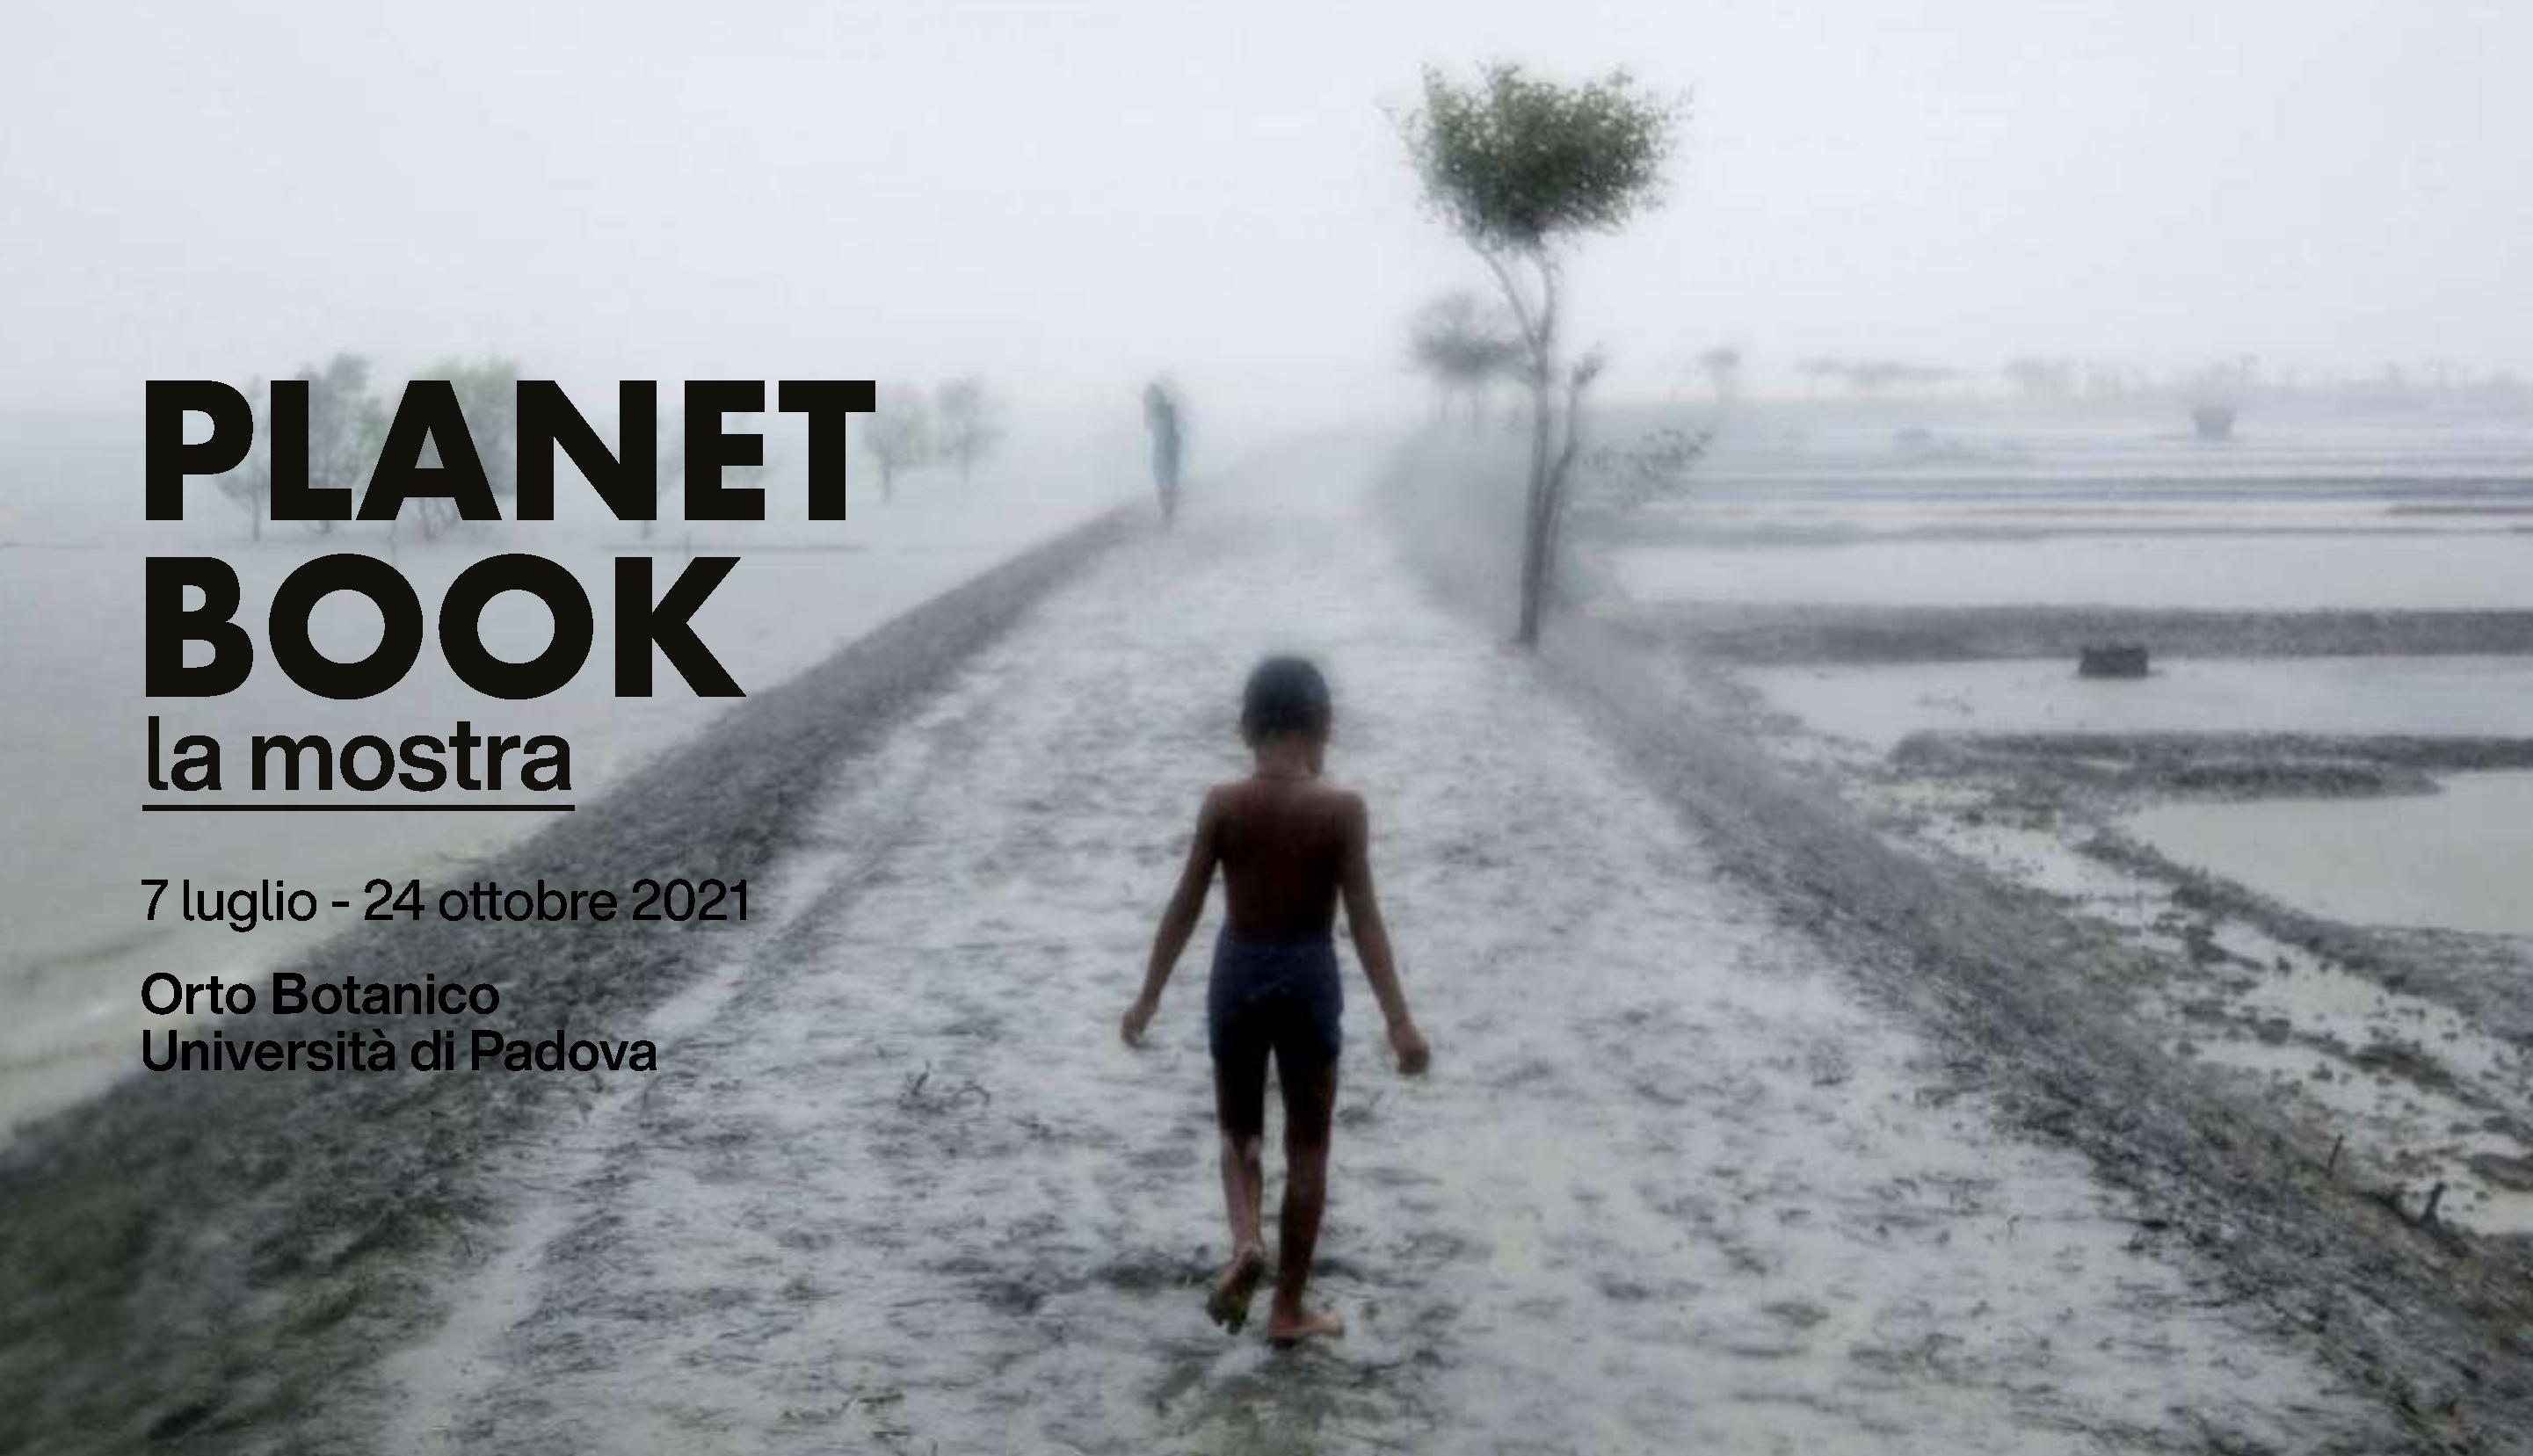 Planet Book - Locandina Mostra